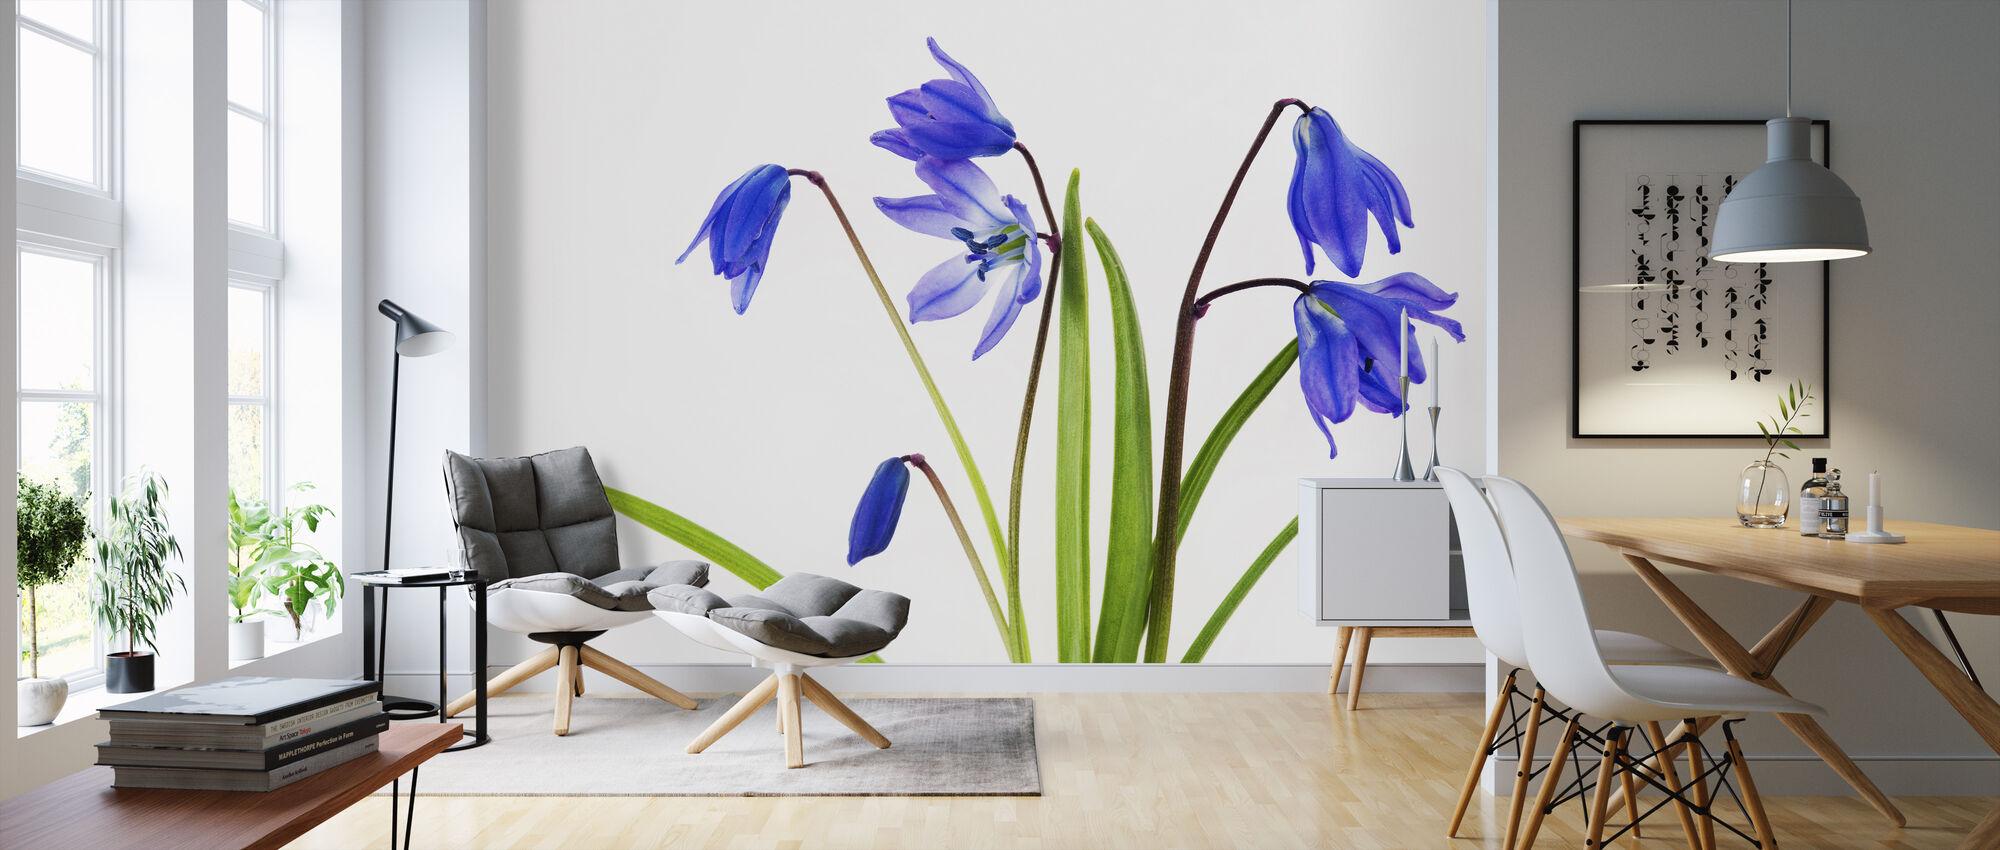 Blauwe Bloemen - Behang - Woonkamer